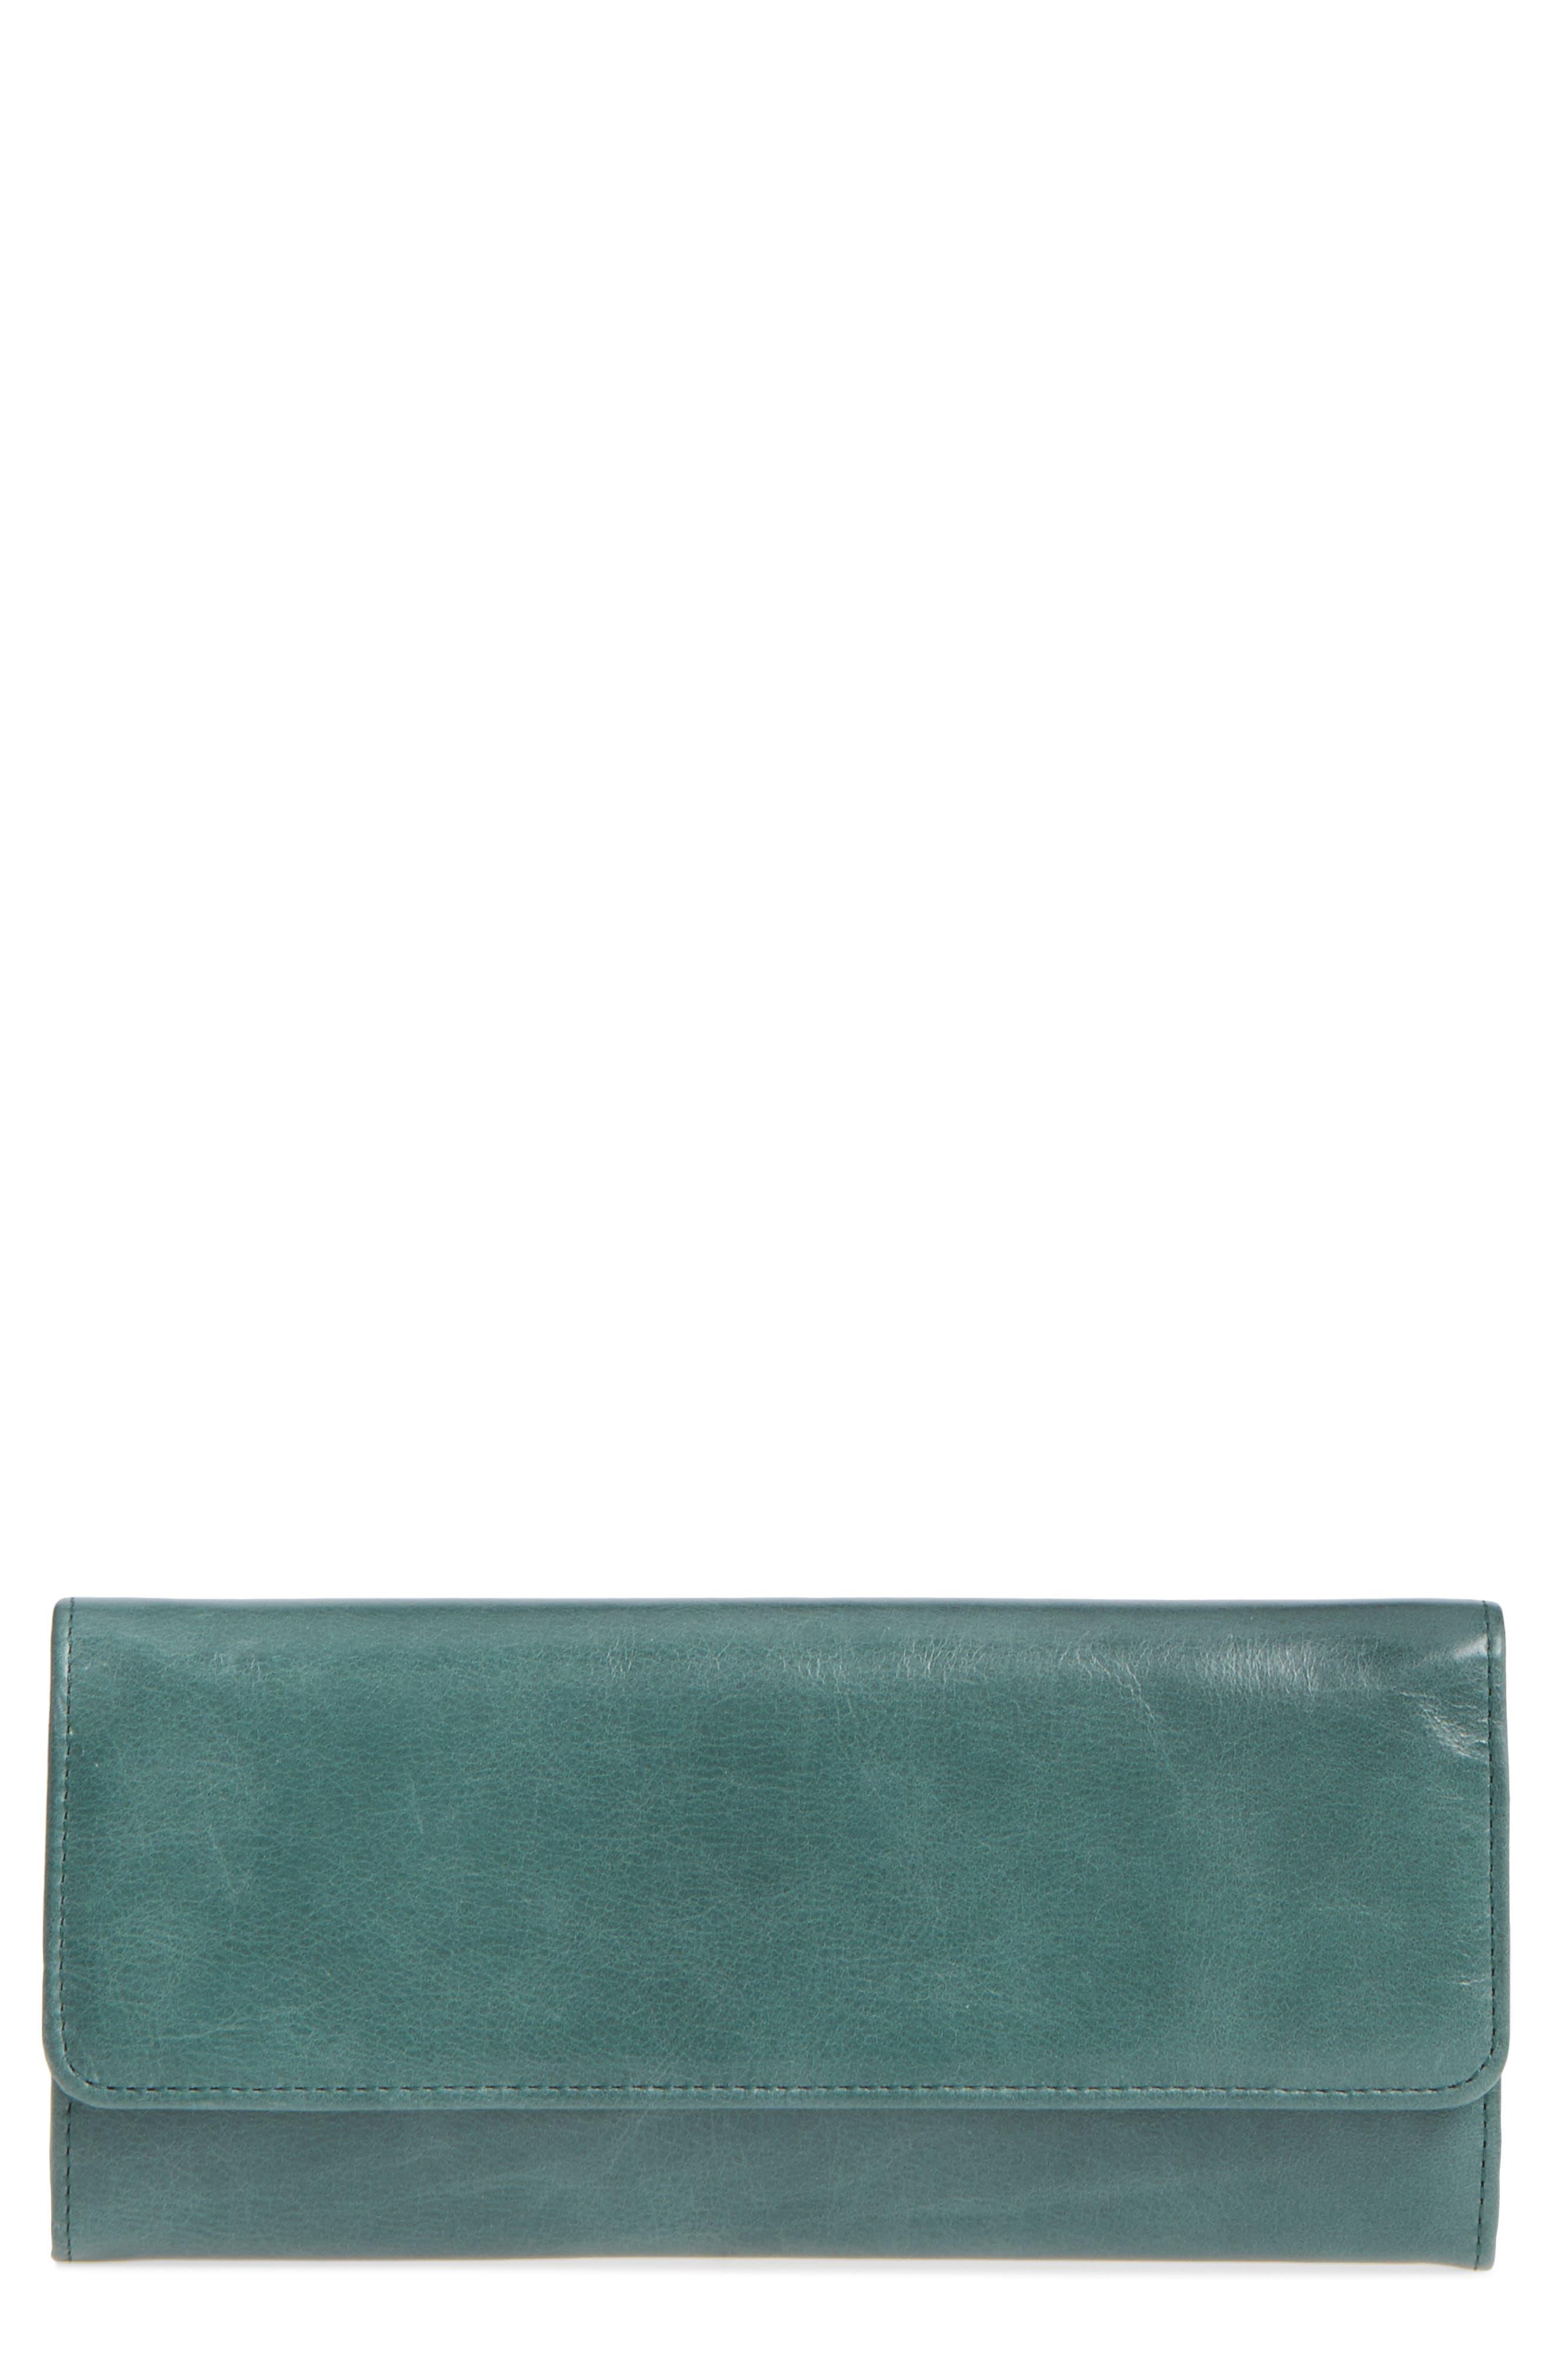 'Sadie' Leather Wallet,                             Main thumbnail 5, color,